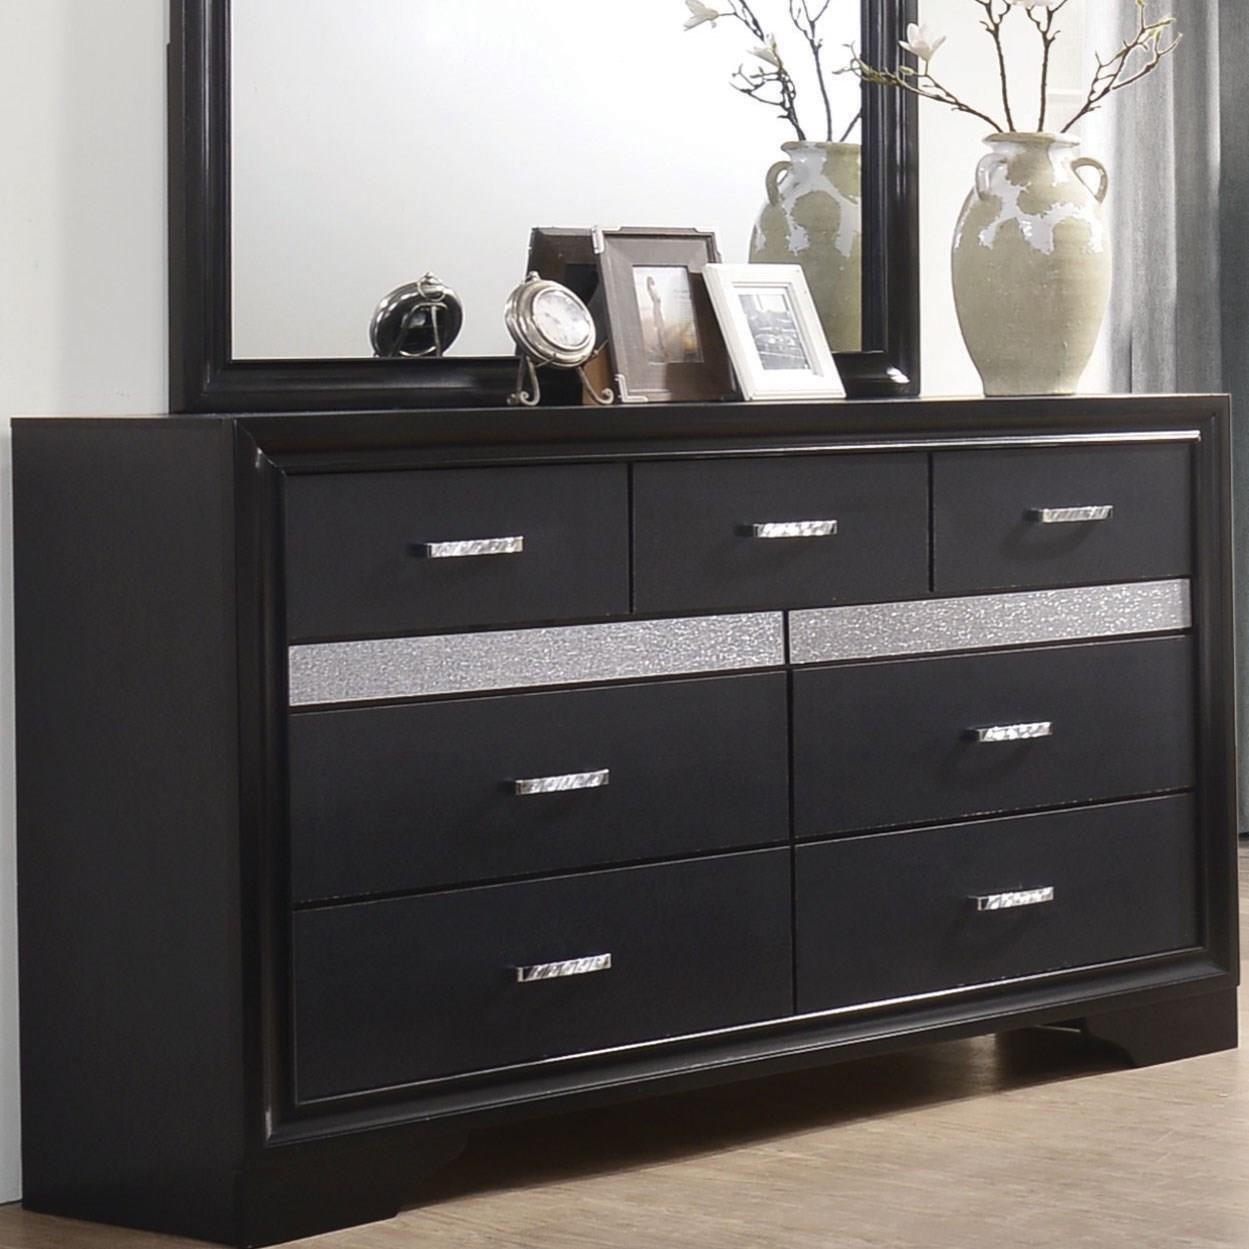 Miranda 7 Drawer Dresser by Coaster at Northeast Factory Direct